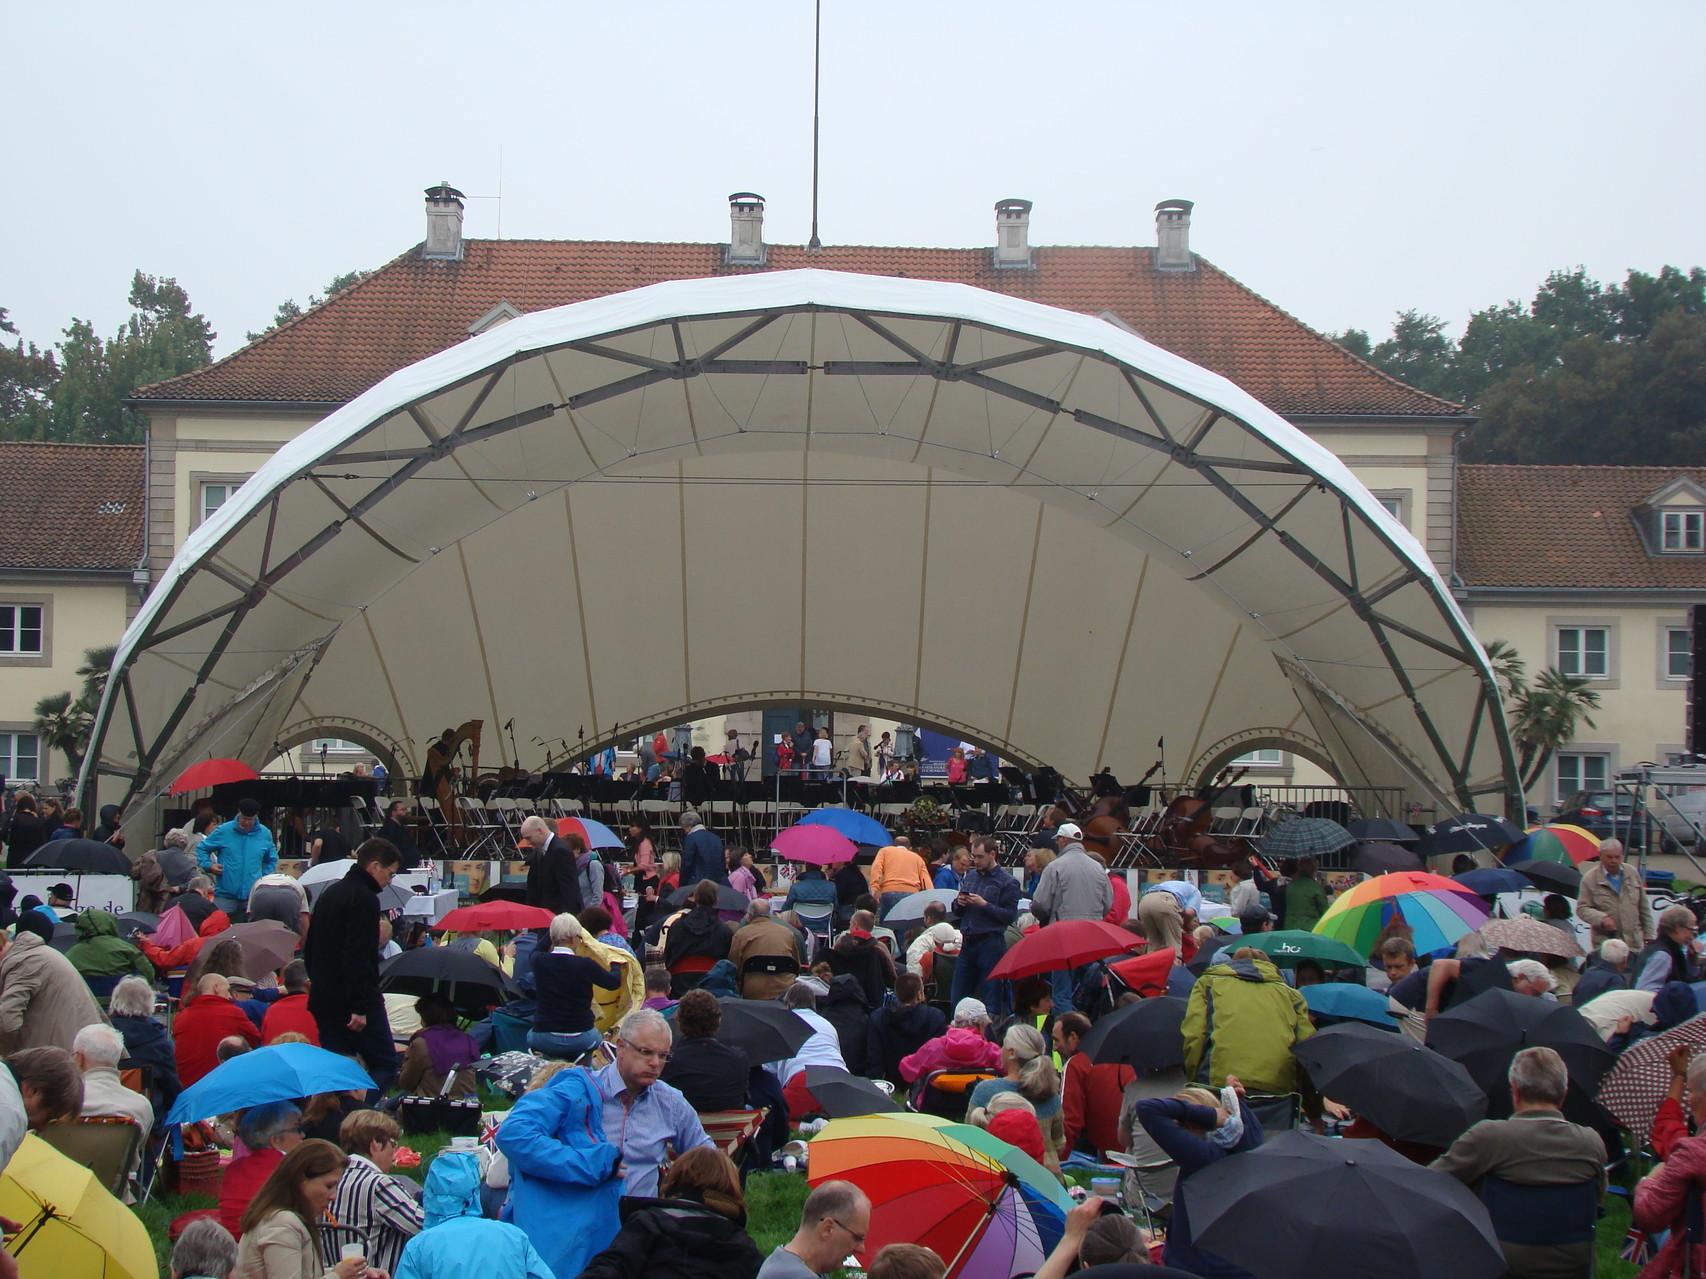 Orchester Open Air, Klassik Open Air, Georgengarten Hannover, Konzertmuschel